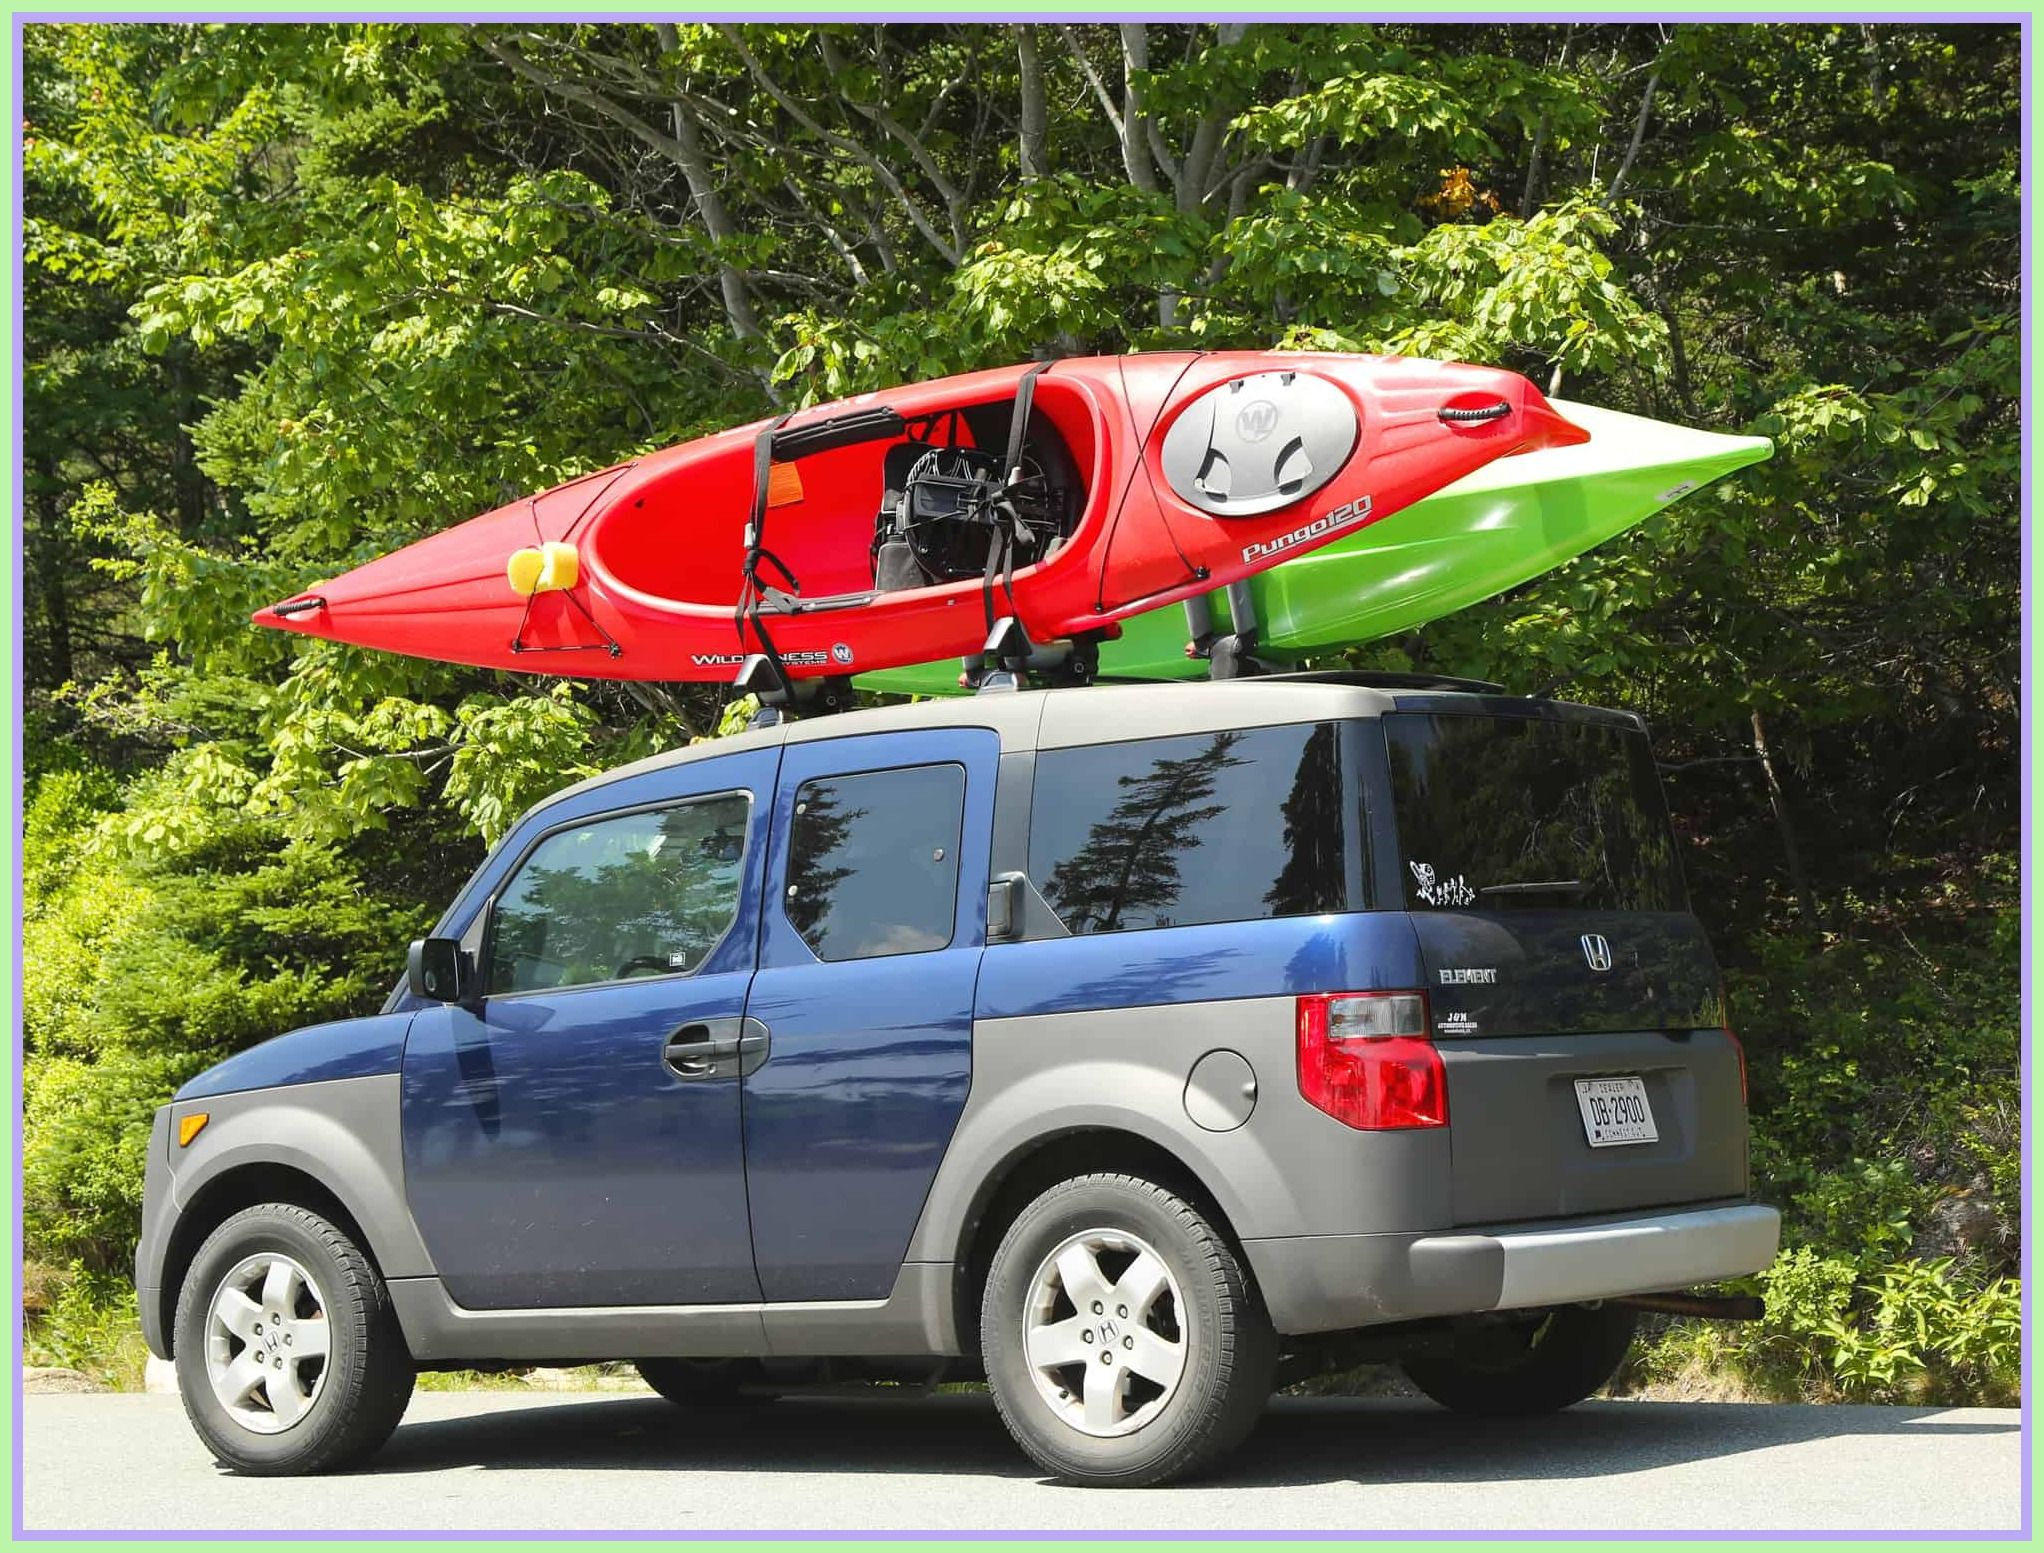 double kayak rack for honda crv-#double #kayak #rack #for #honda #crv Please Click Link To Find More Reference,,, ENJOY!!